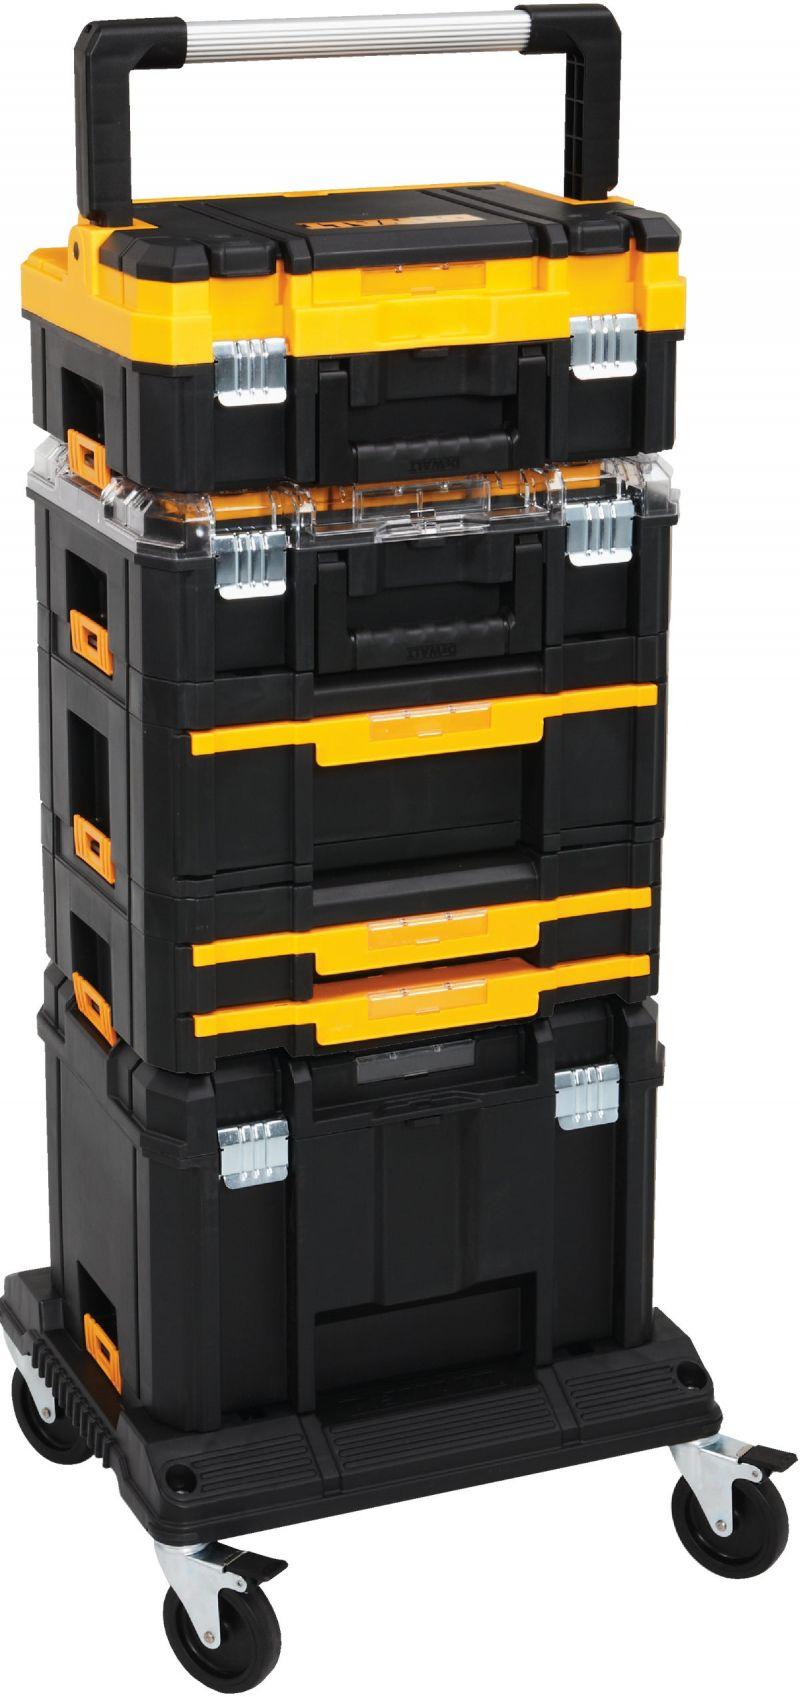 H Black DeWalt TSTAK 17 in W x 13 in Plastic Flat Top Tool Box 13 in